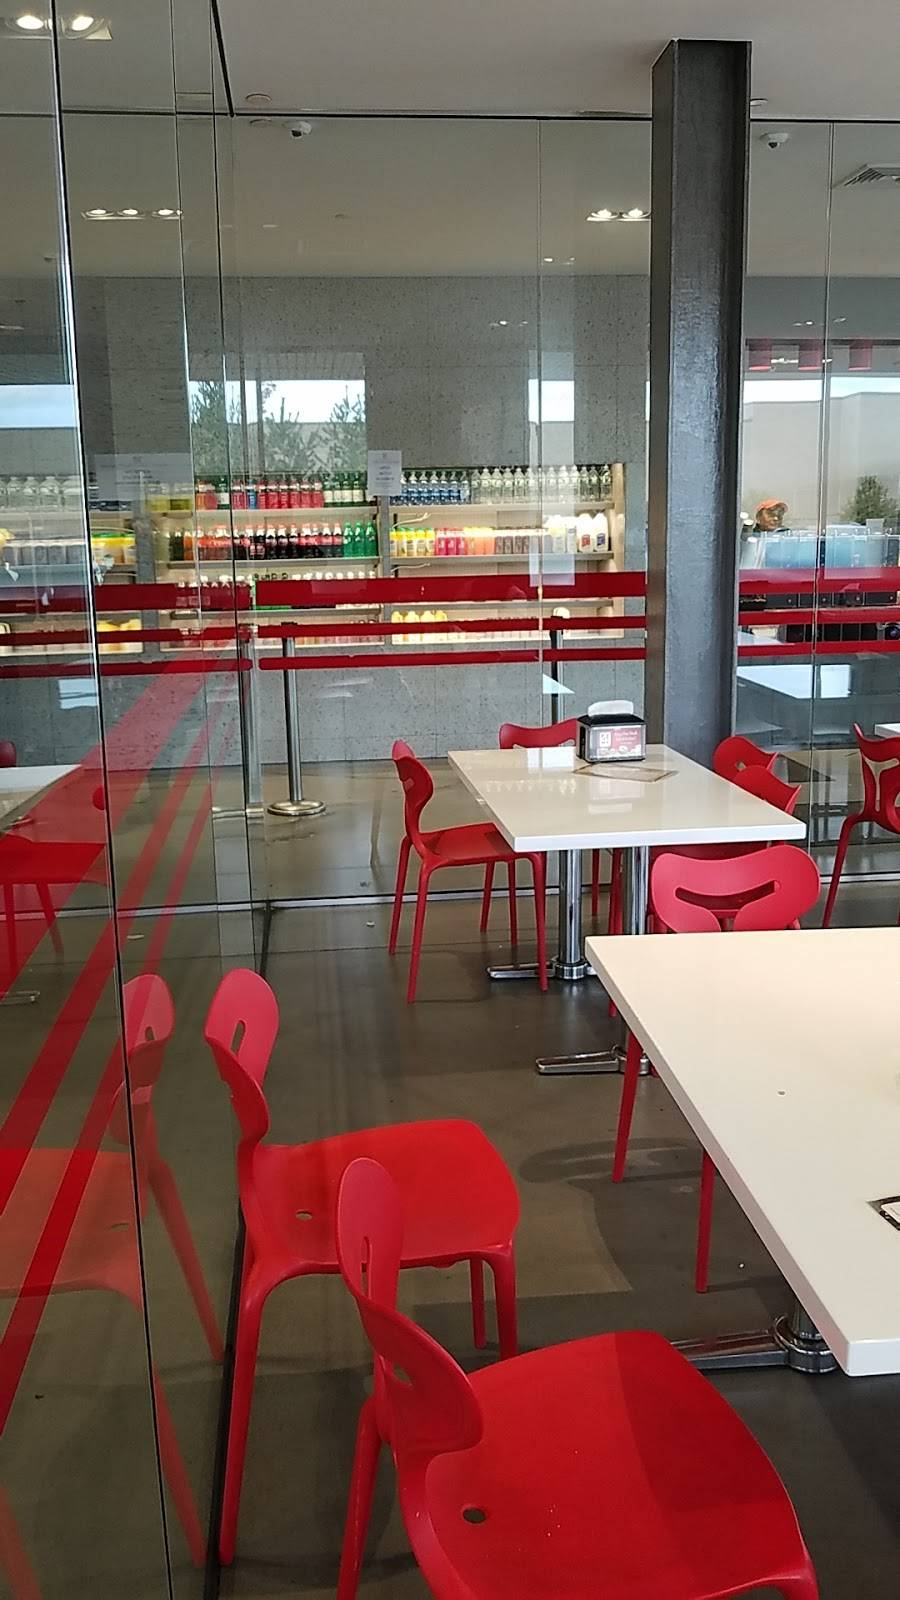 Four Corners Kosher Bagel & Cafe | cafe | 150 James St, Lakewood, NJ 08701, USA | 7327302381 OR +1 732-730-2381